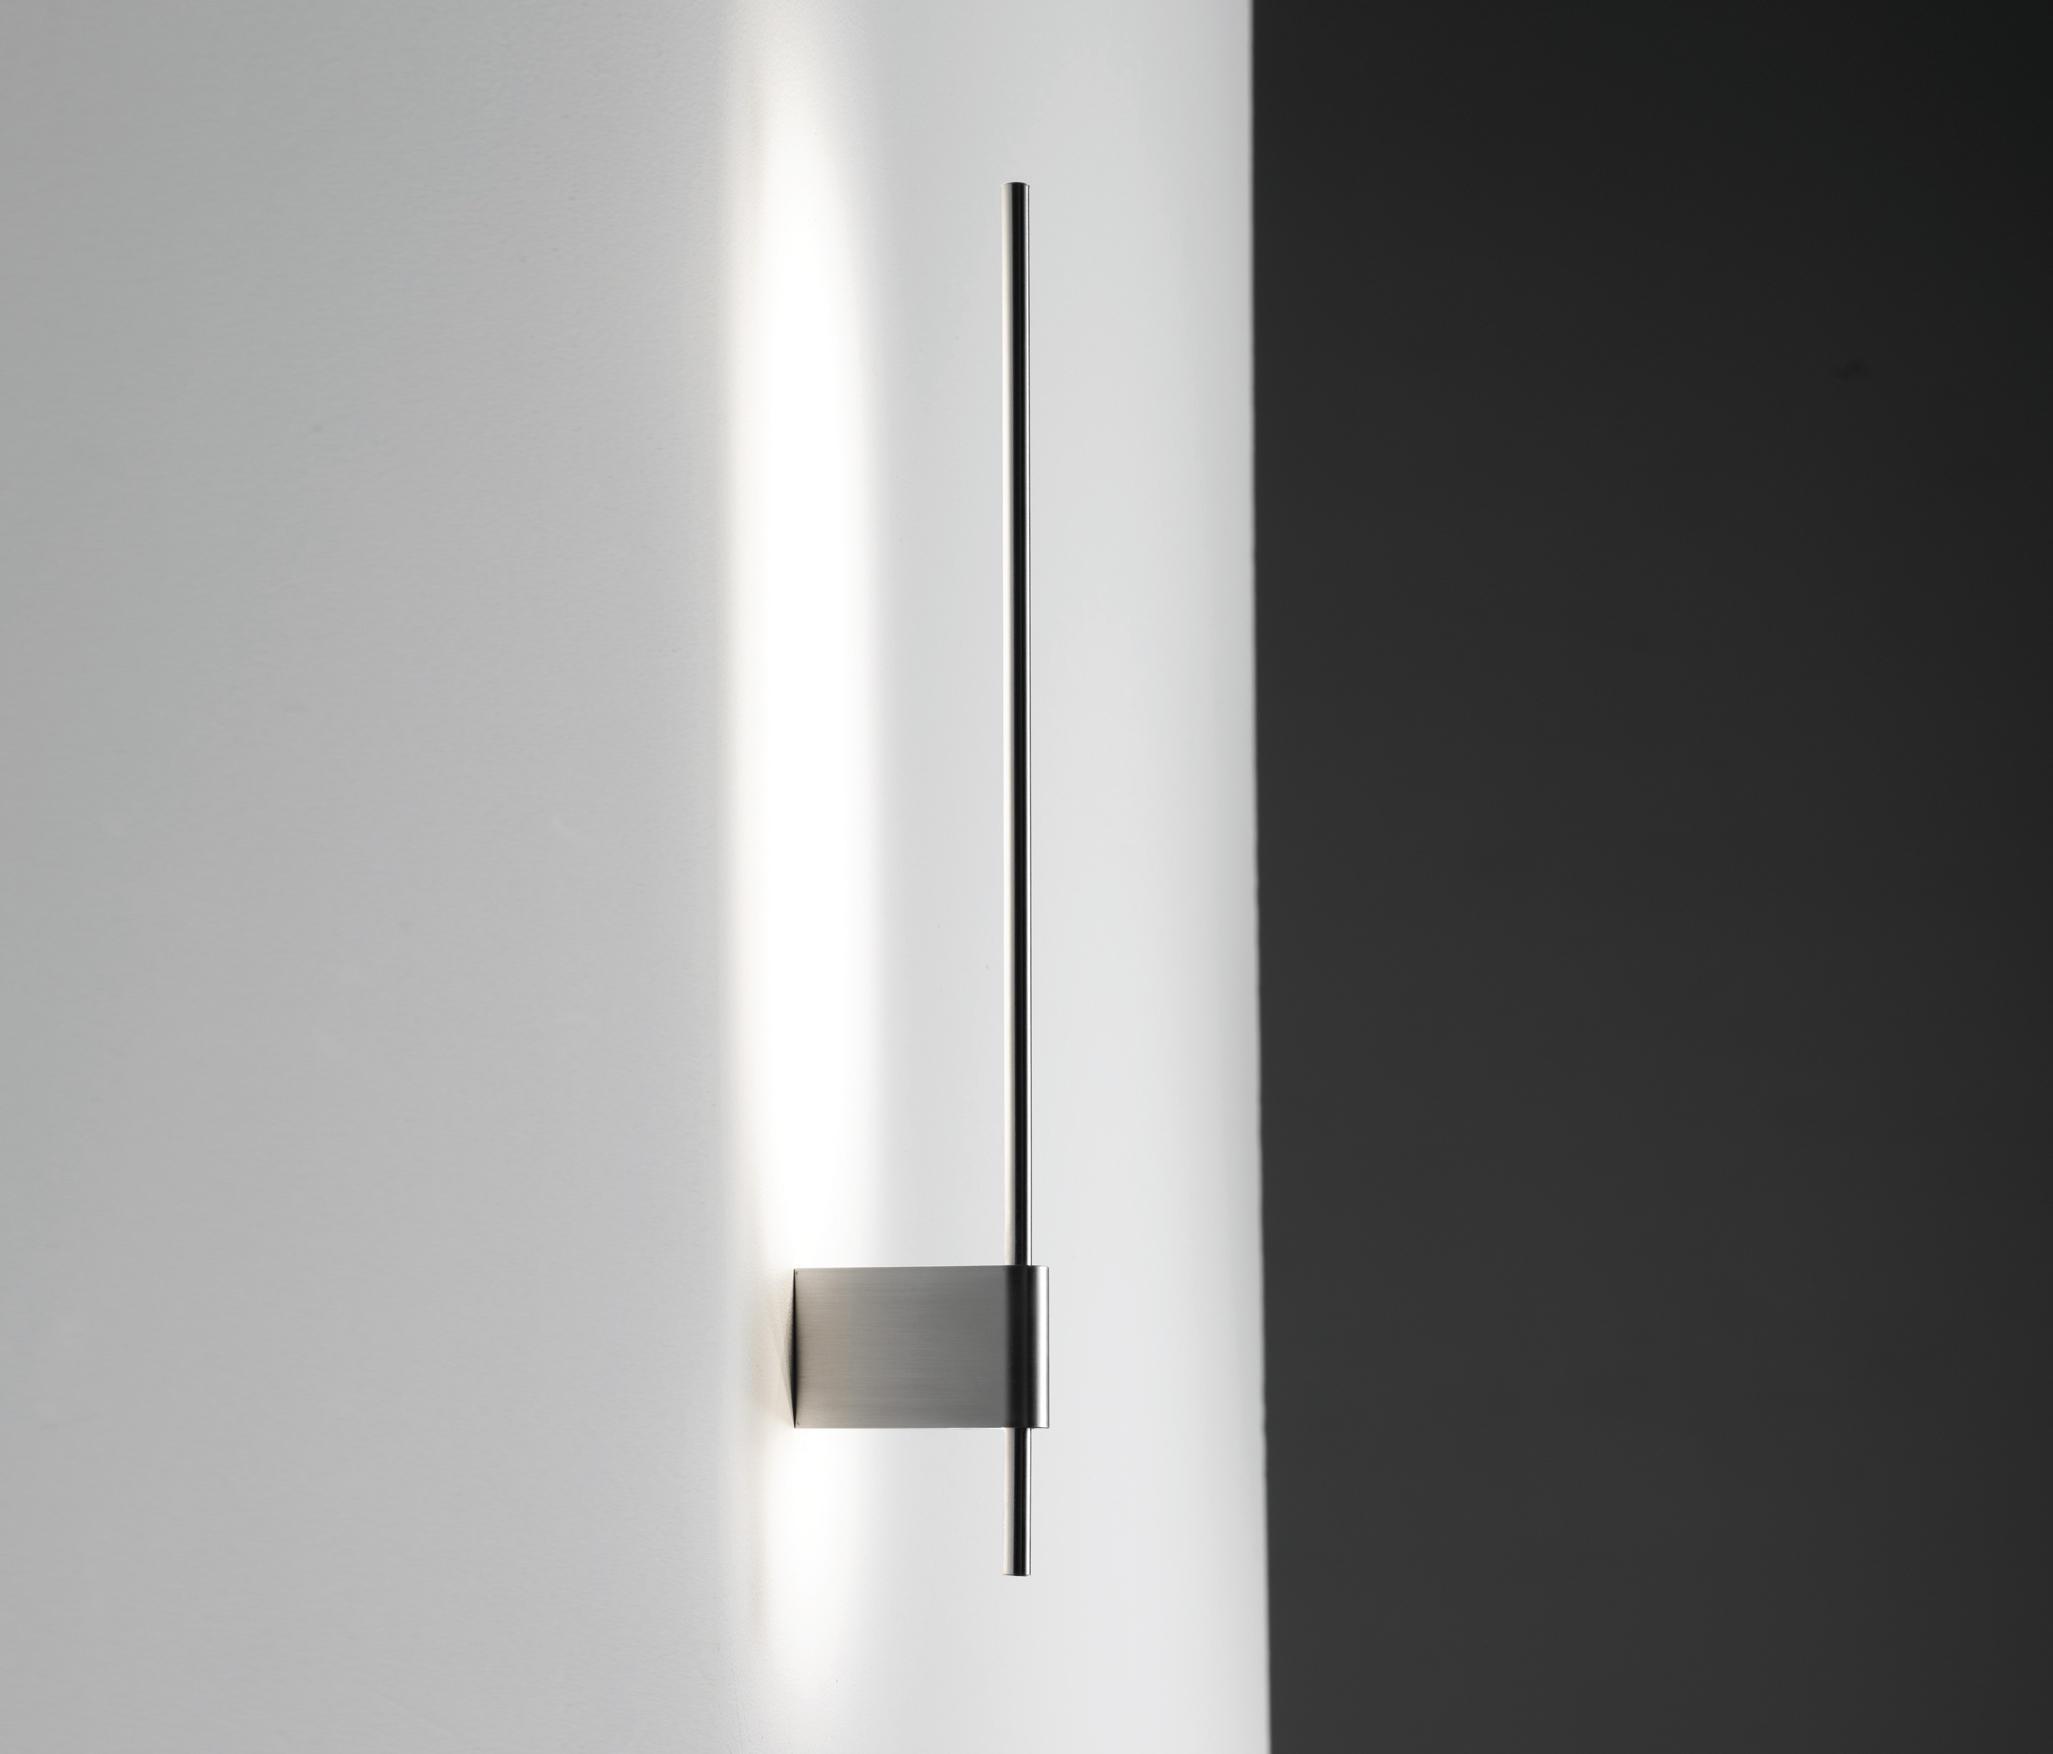 AX LED WALL LAMP - Wall lights from STENG LICHT | Architonic